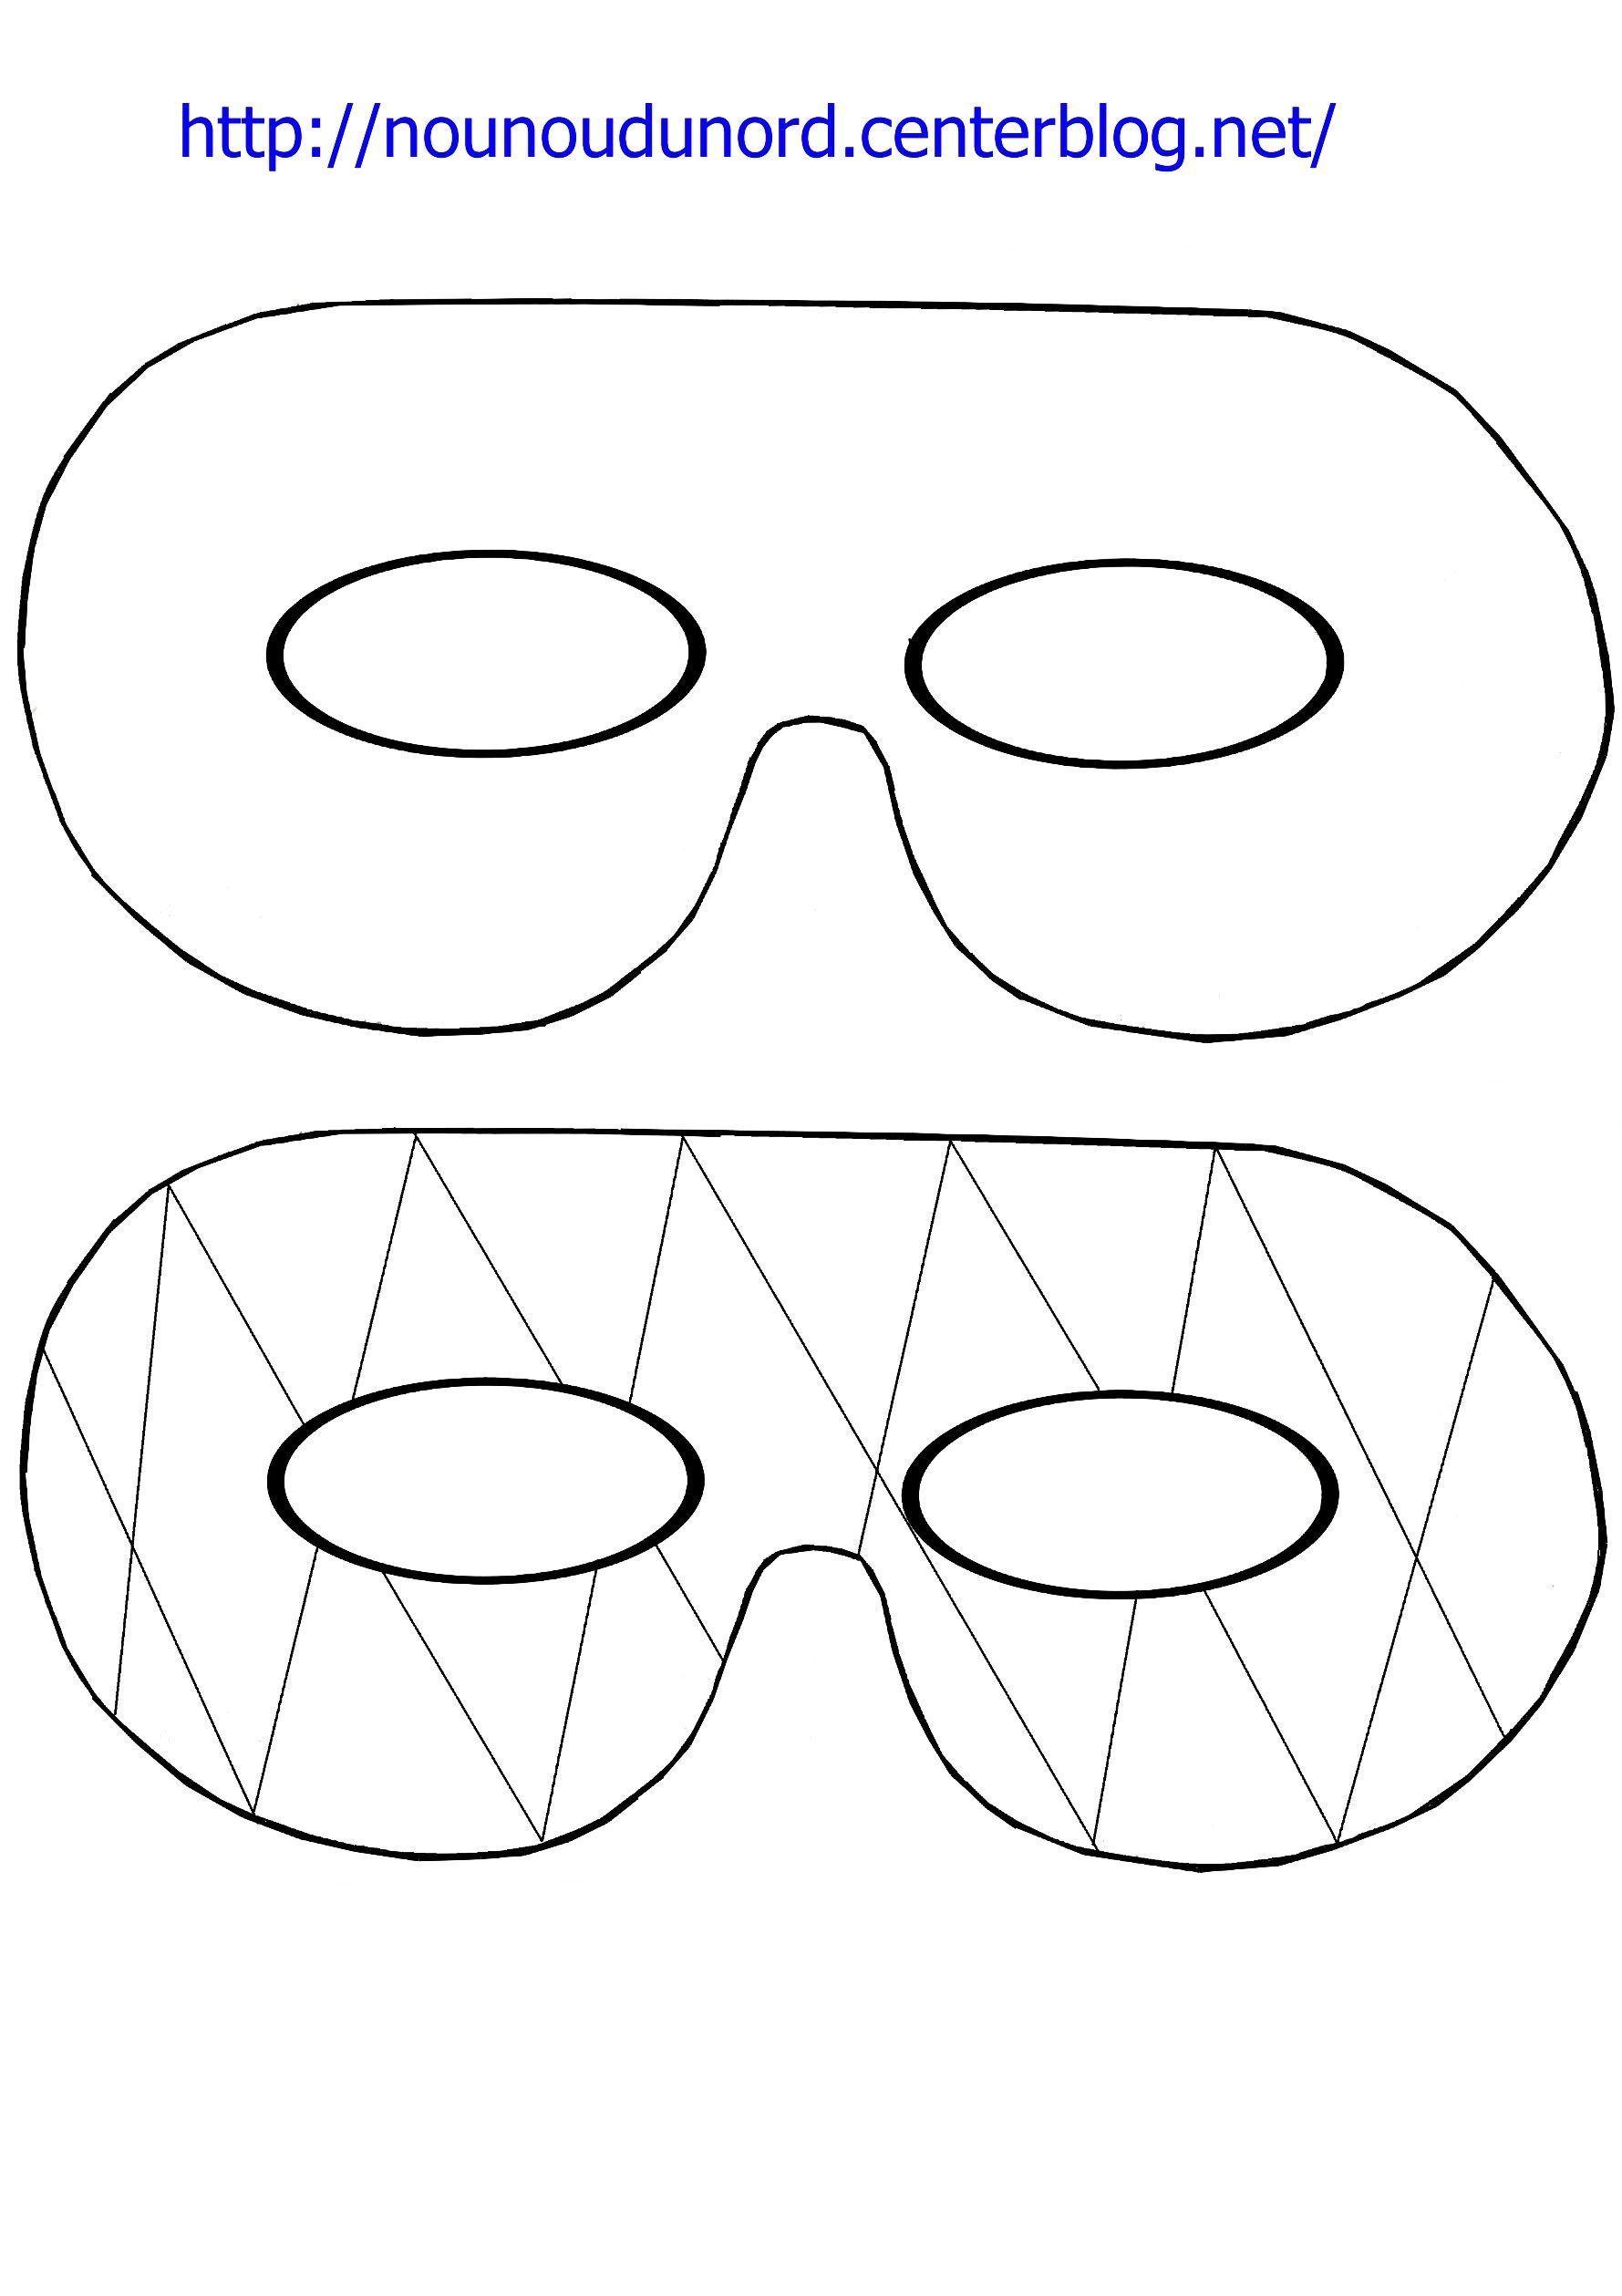 Masque simple et arlequin imprimer - Masque de carnaval a imprimer ...